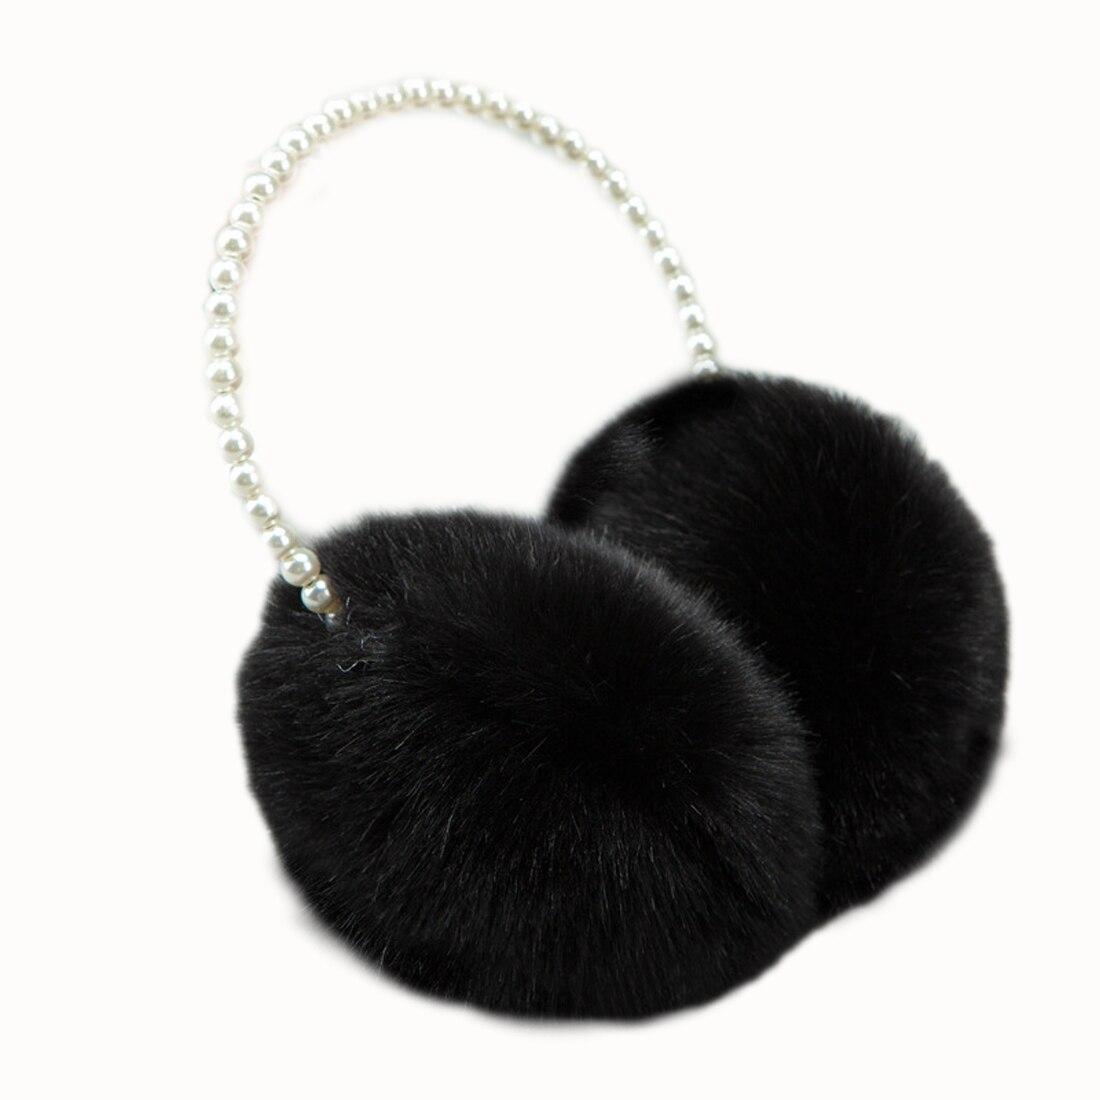 2018 Pearl Winter Earmuff  Rabbit Fur Women Earmuffs Winter Ear Warmers Ear Cover Women Big Plush Warm Earmuffs